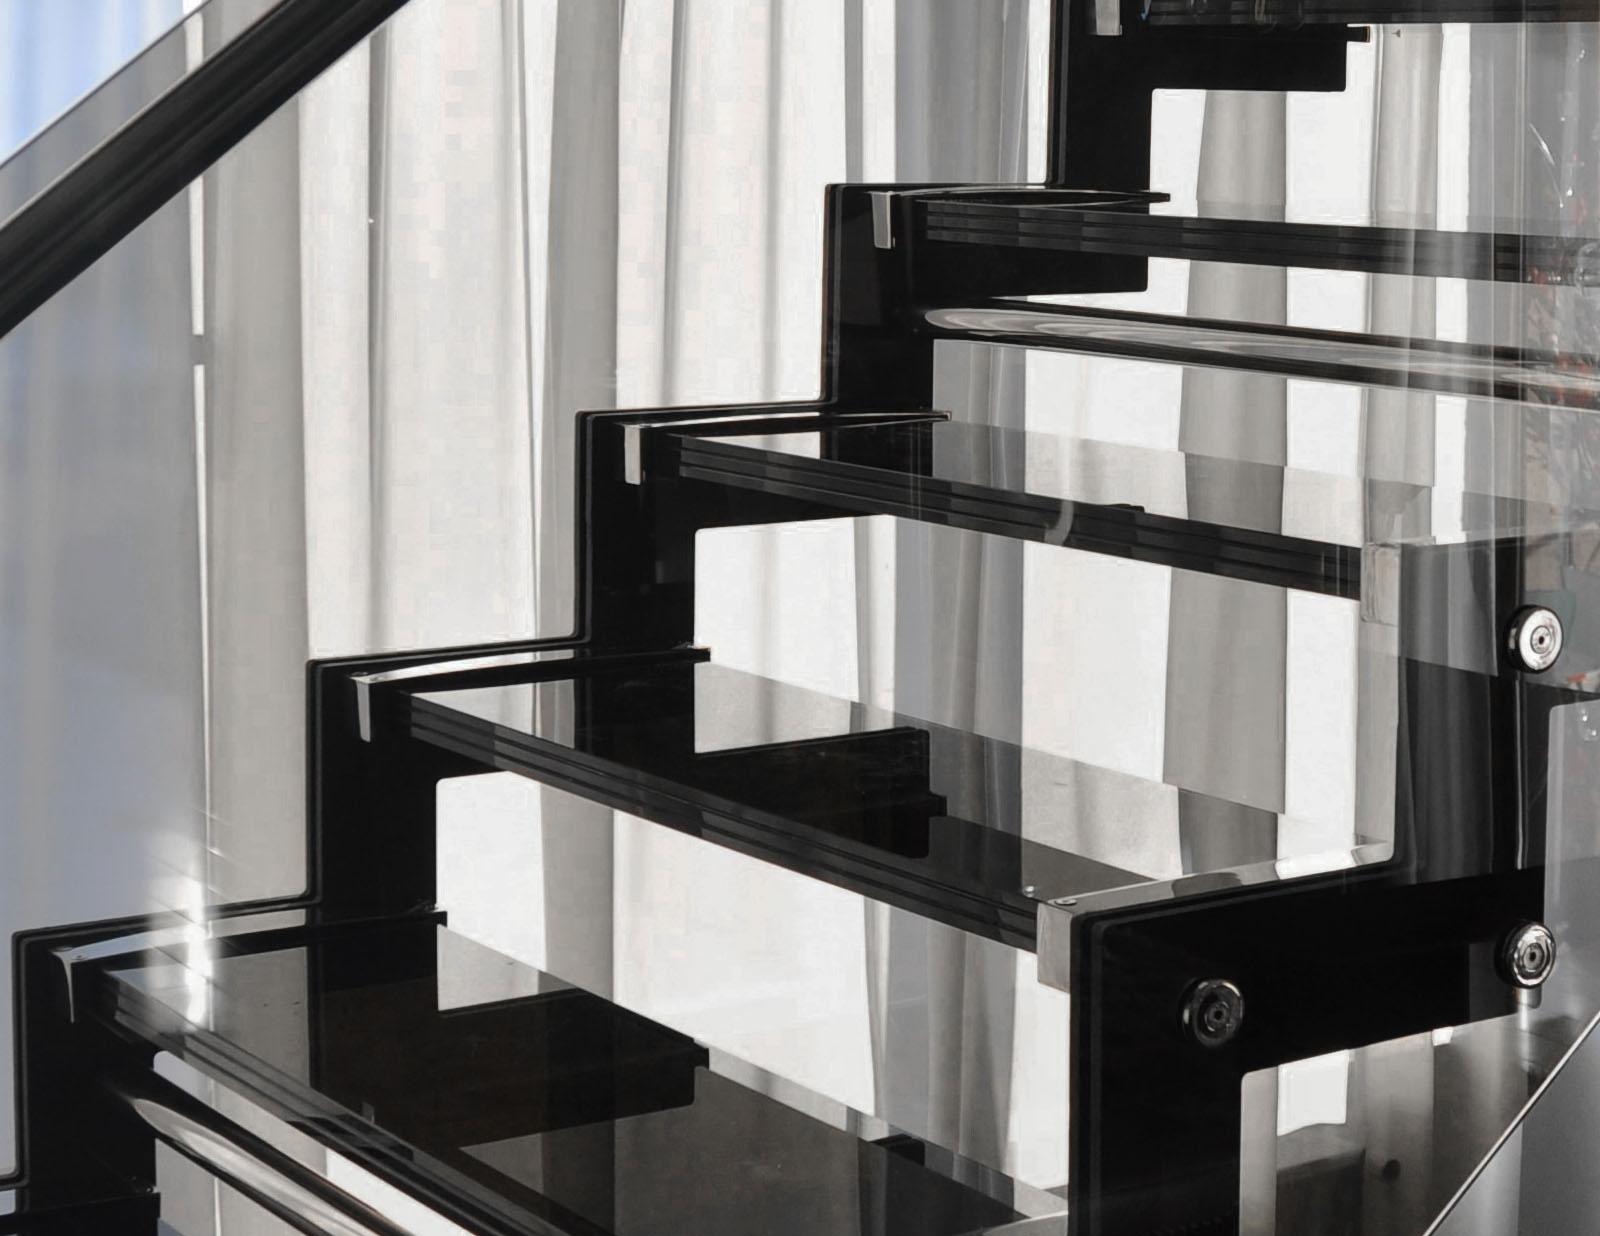 Scara casa metal balustrada sticla inox haute couture